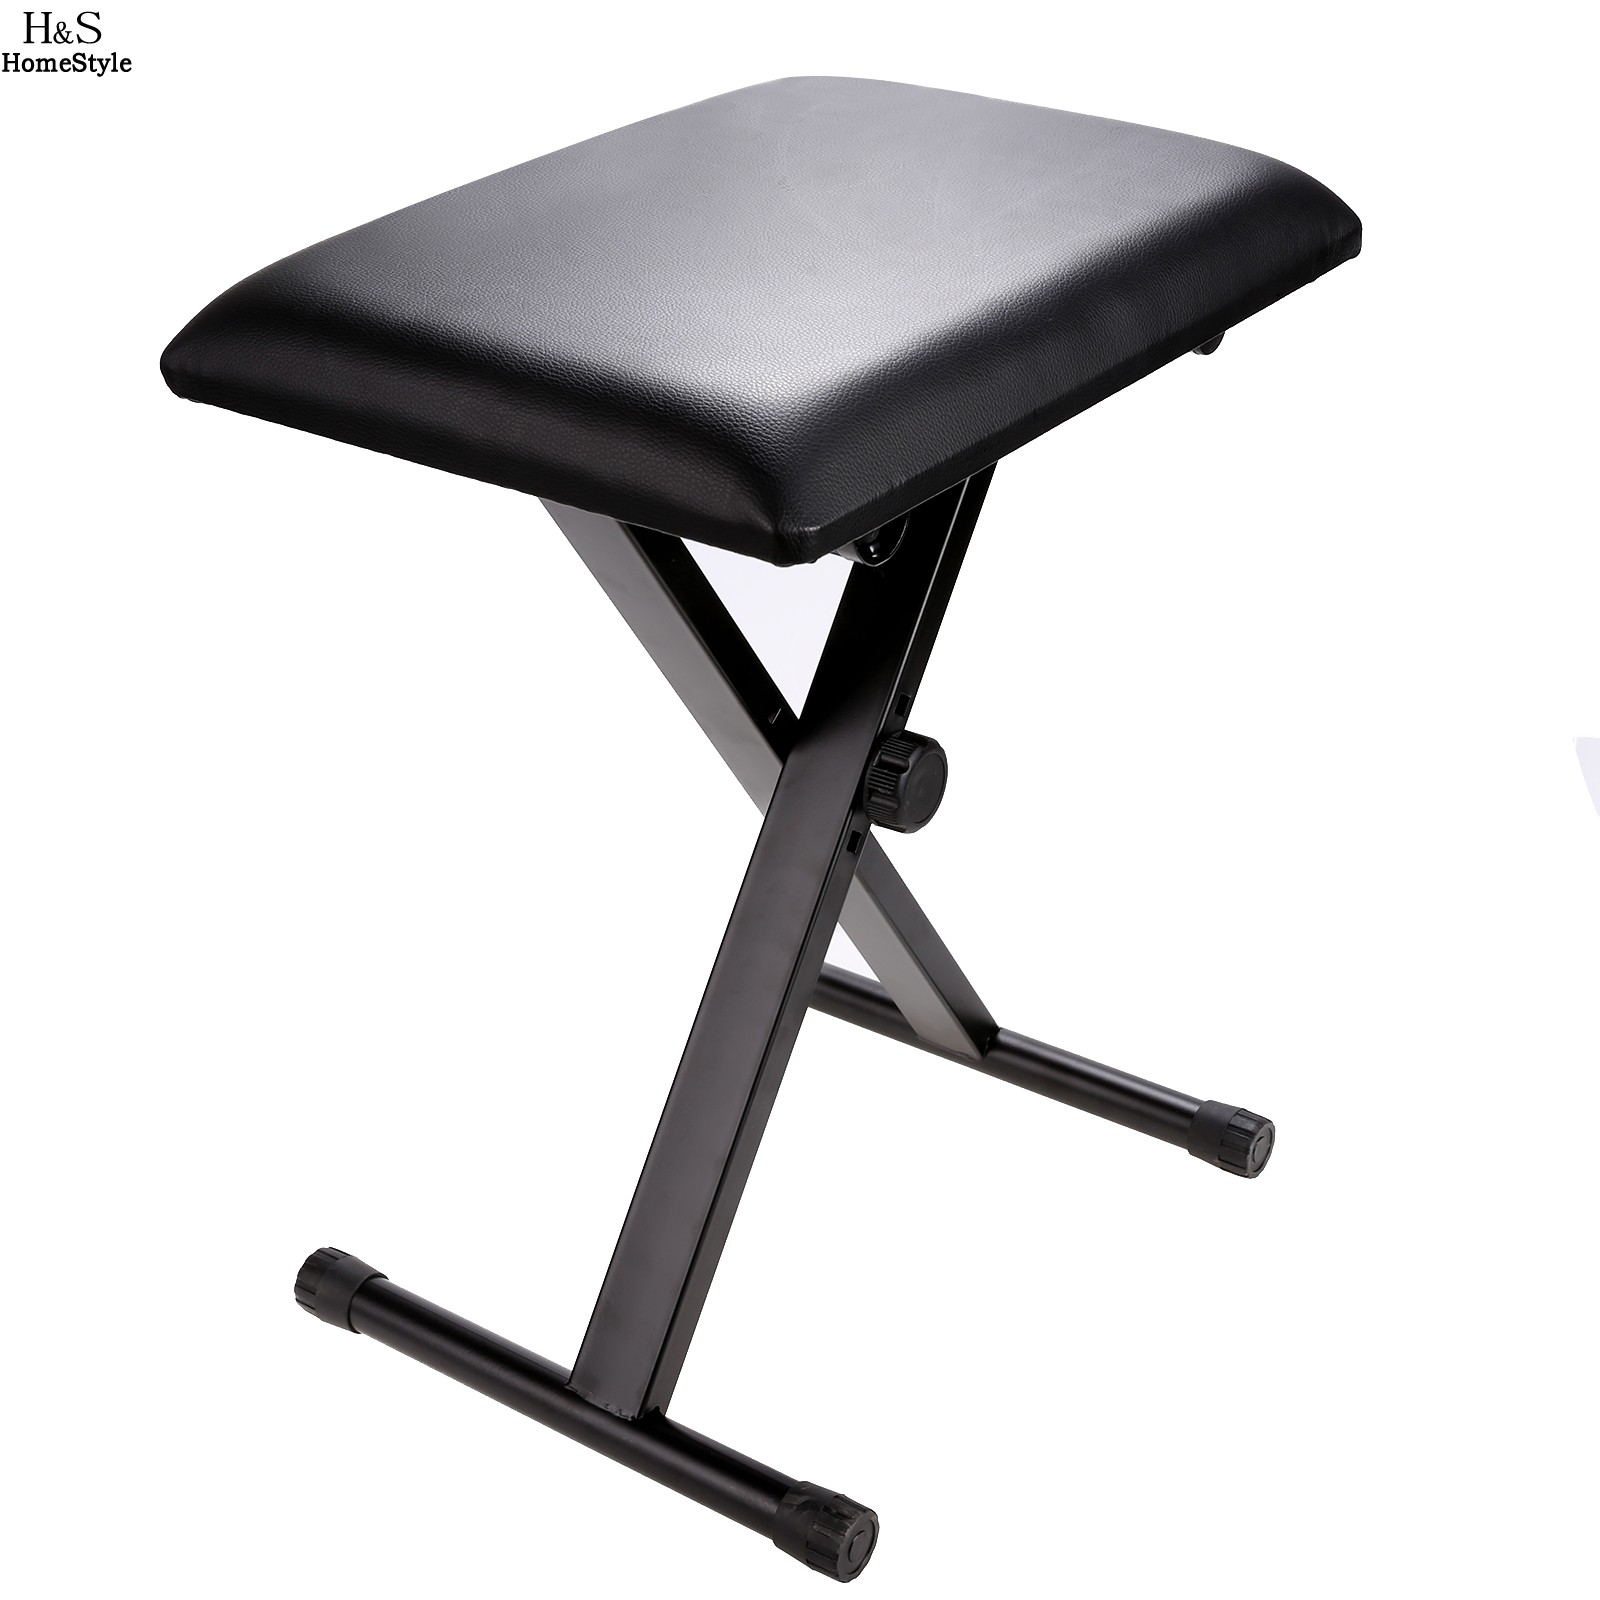 folding chair rubber feet ergonomic malta homdox adjustable piano keyboard bench leather padded seat stool n30a